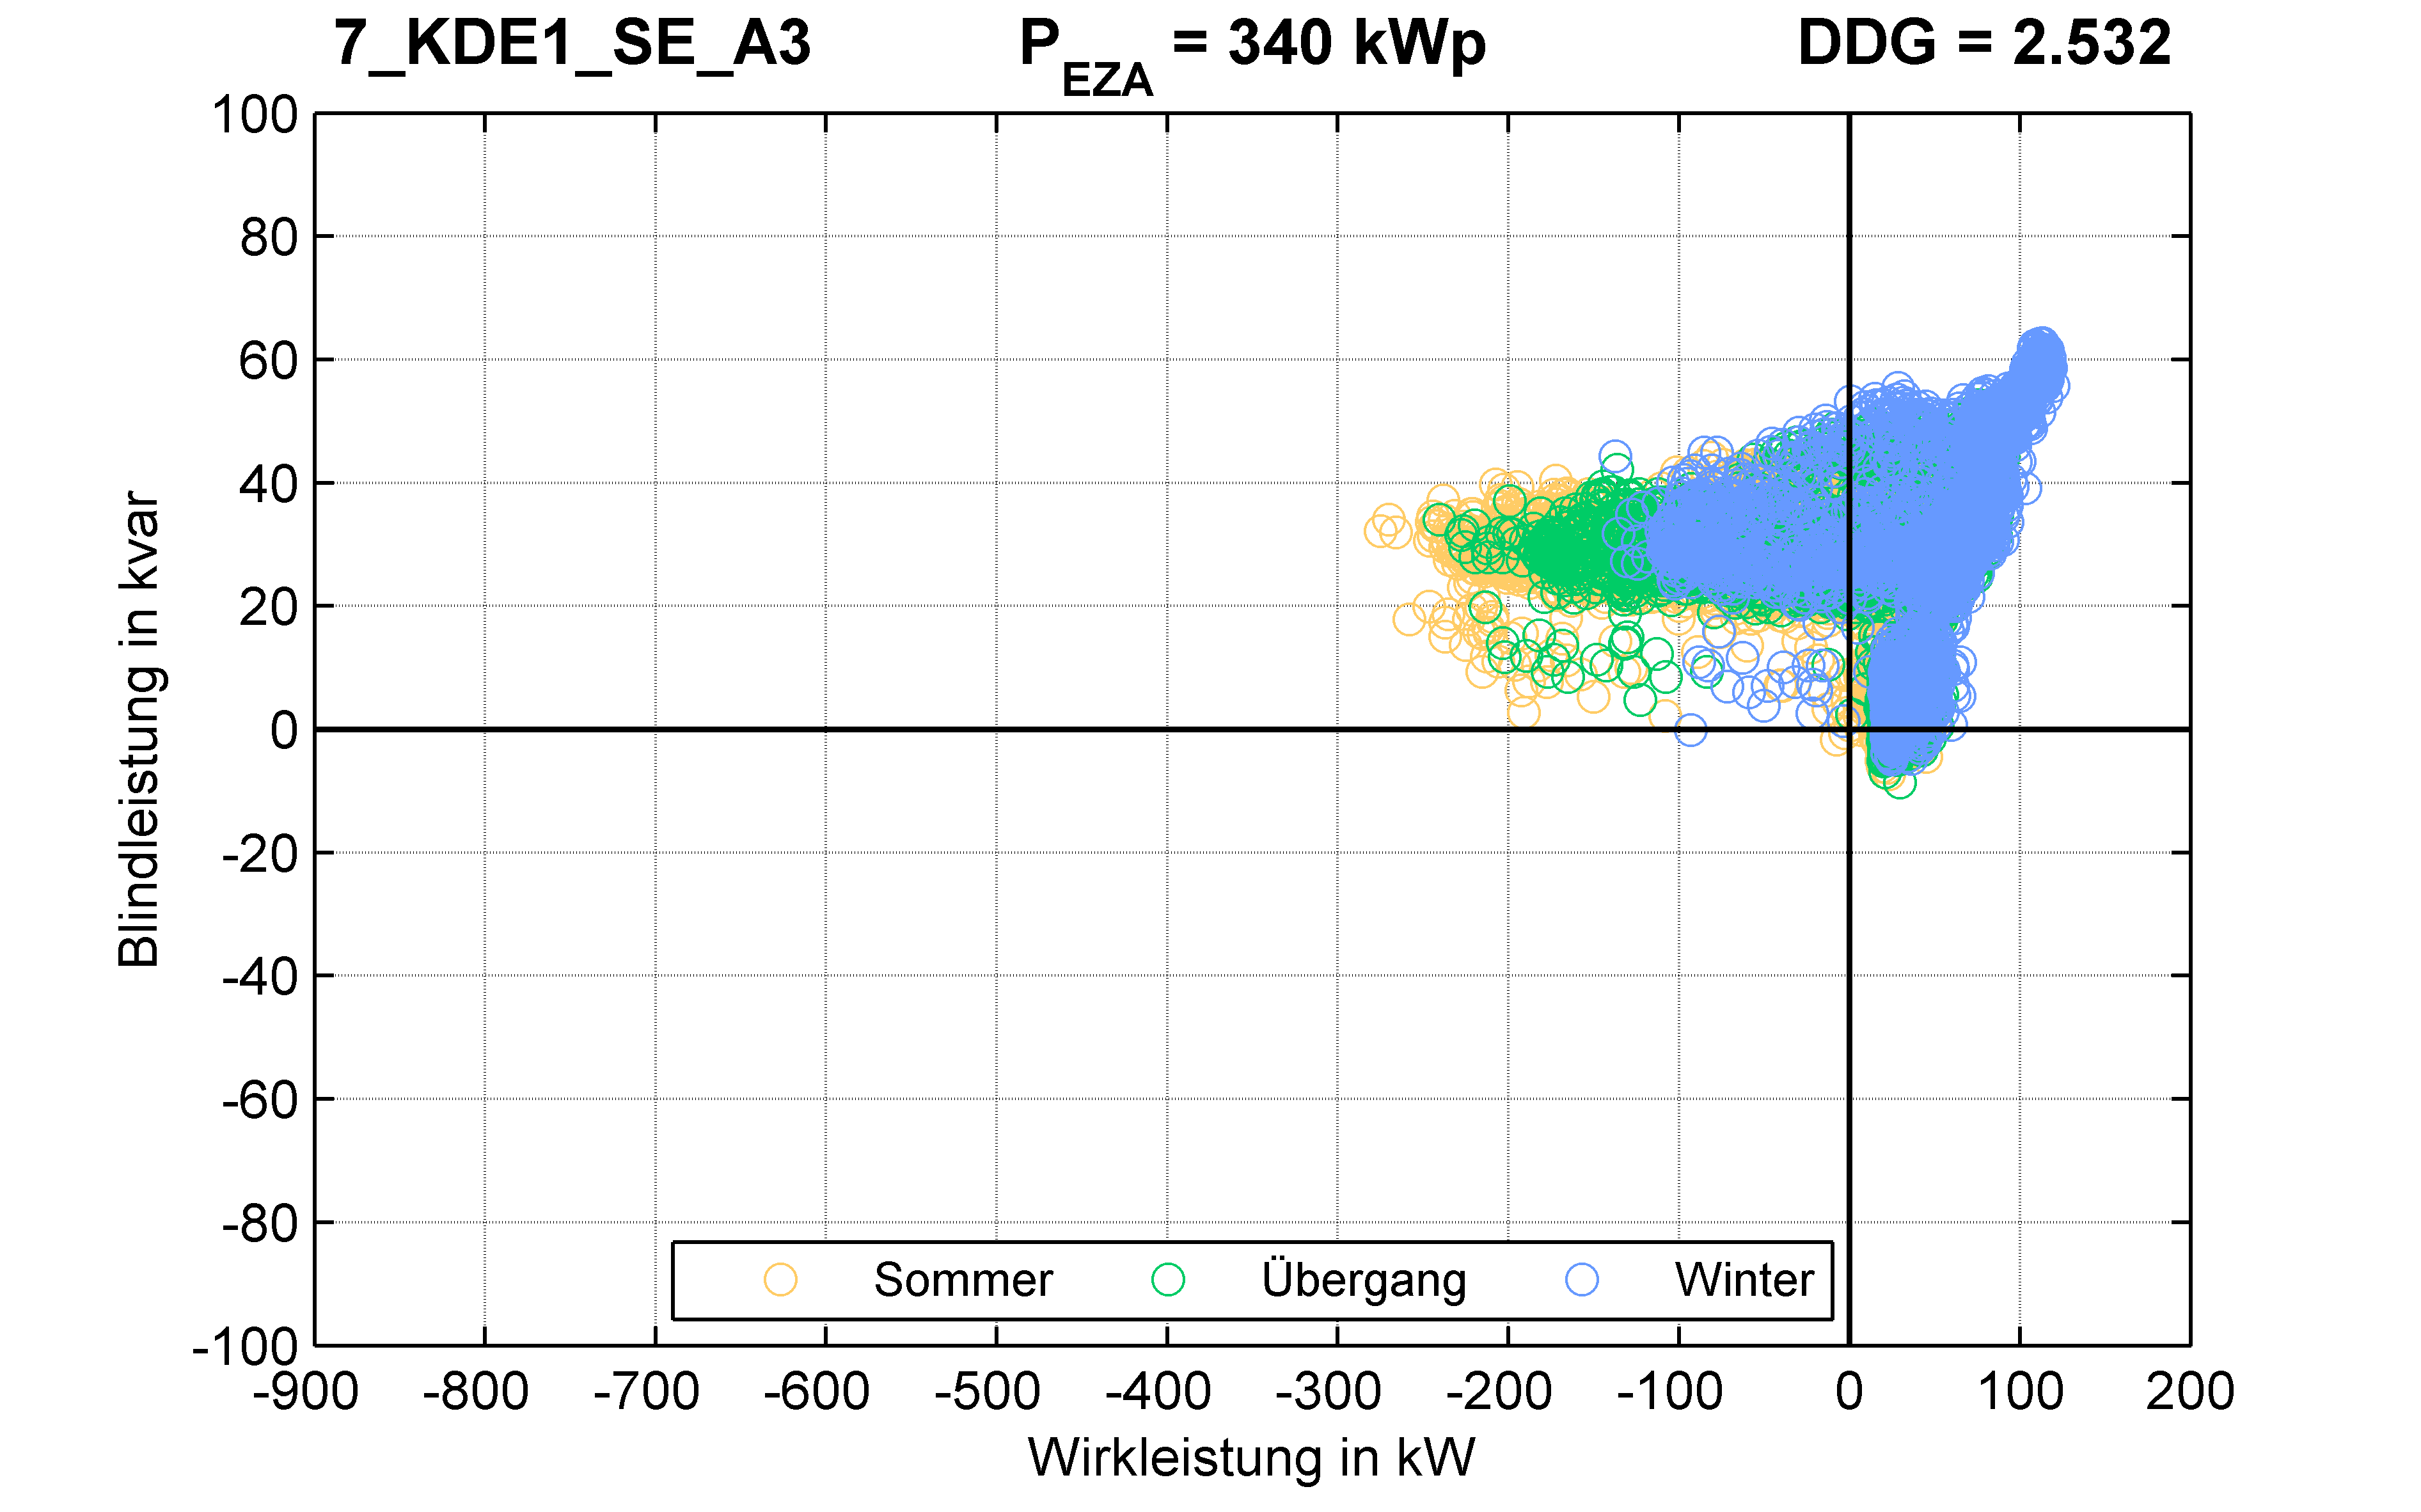 KDE1 | Längsregler (SE) A3 | PQ-Verhalten